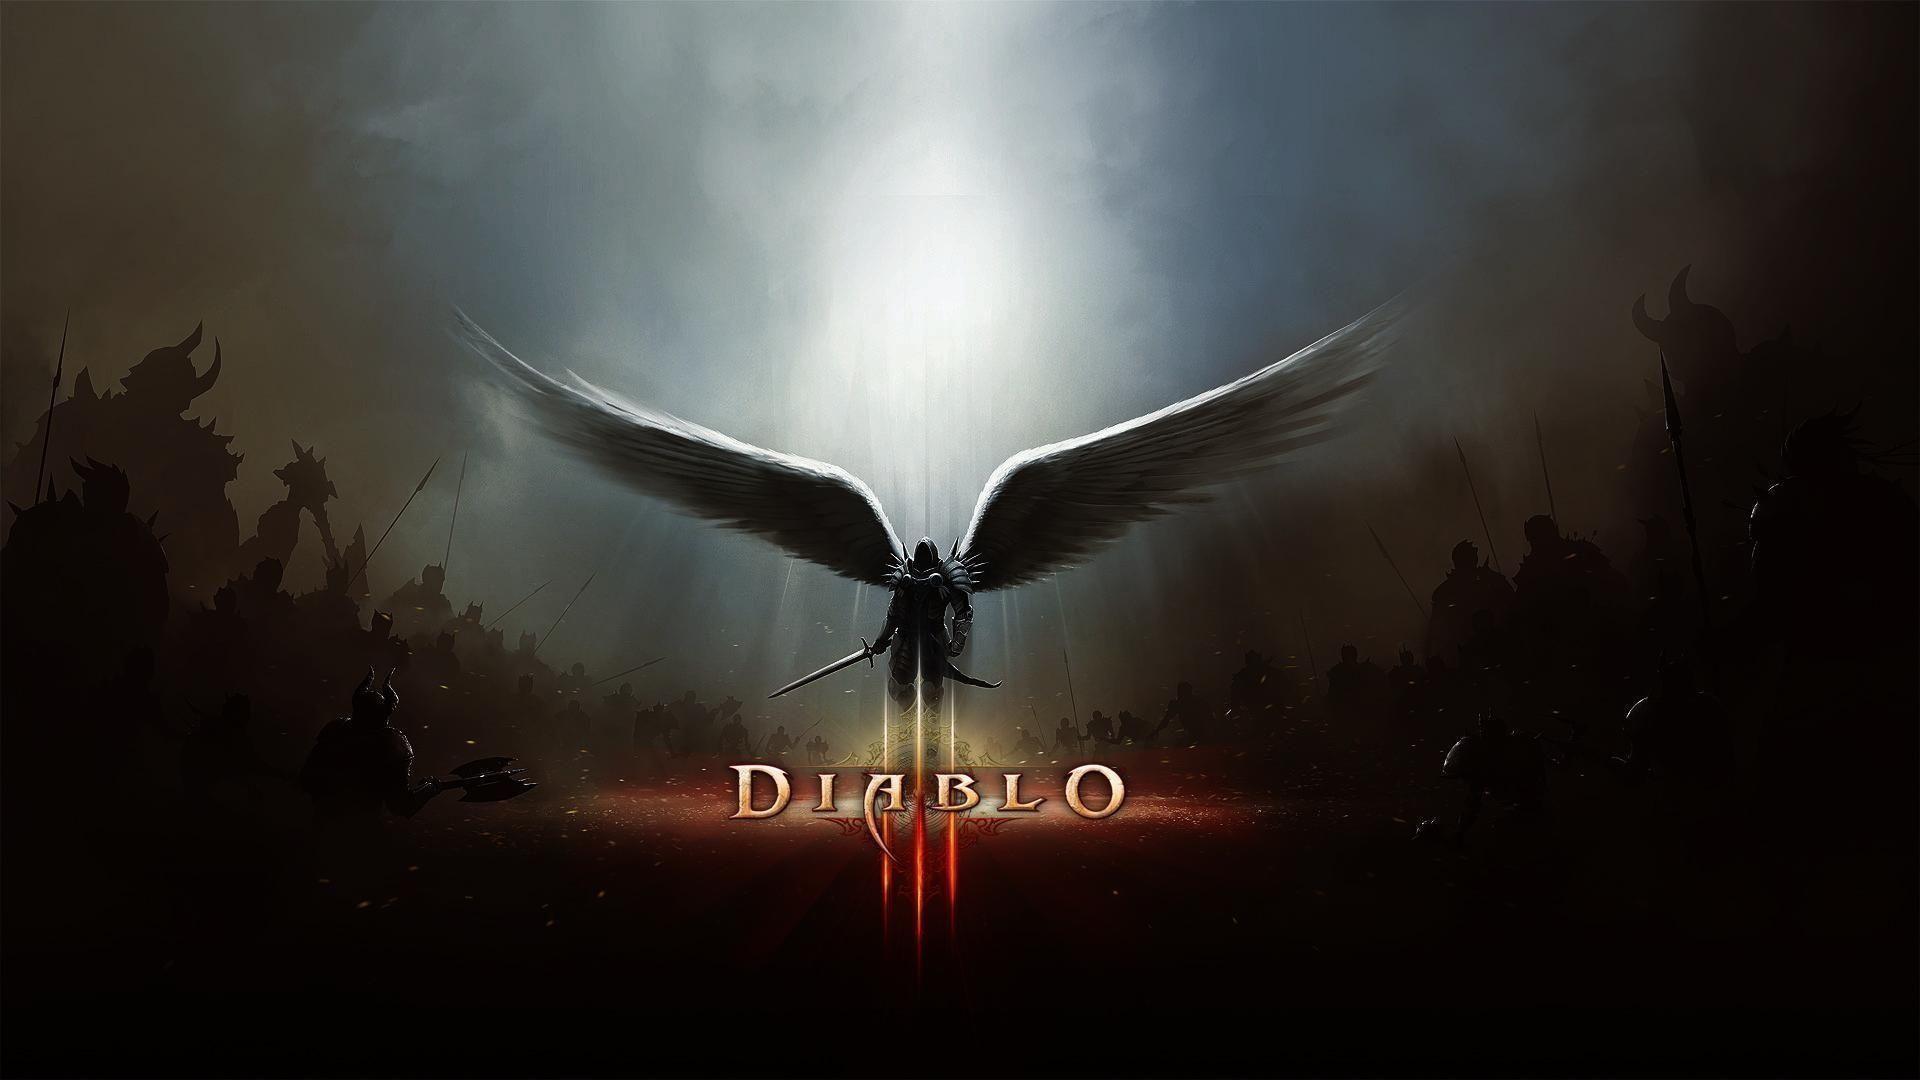 Diablo 3 Wallpaper ·â'